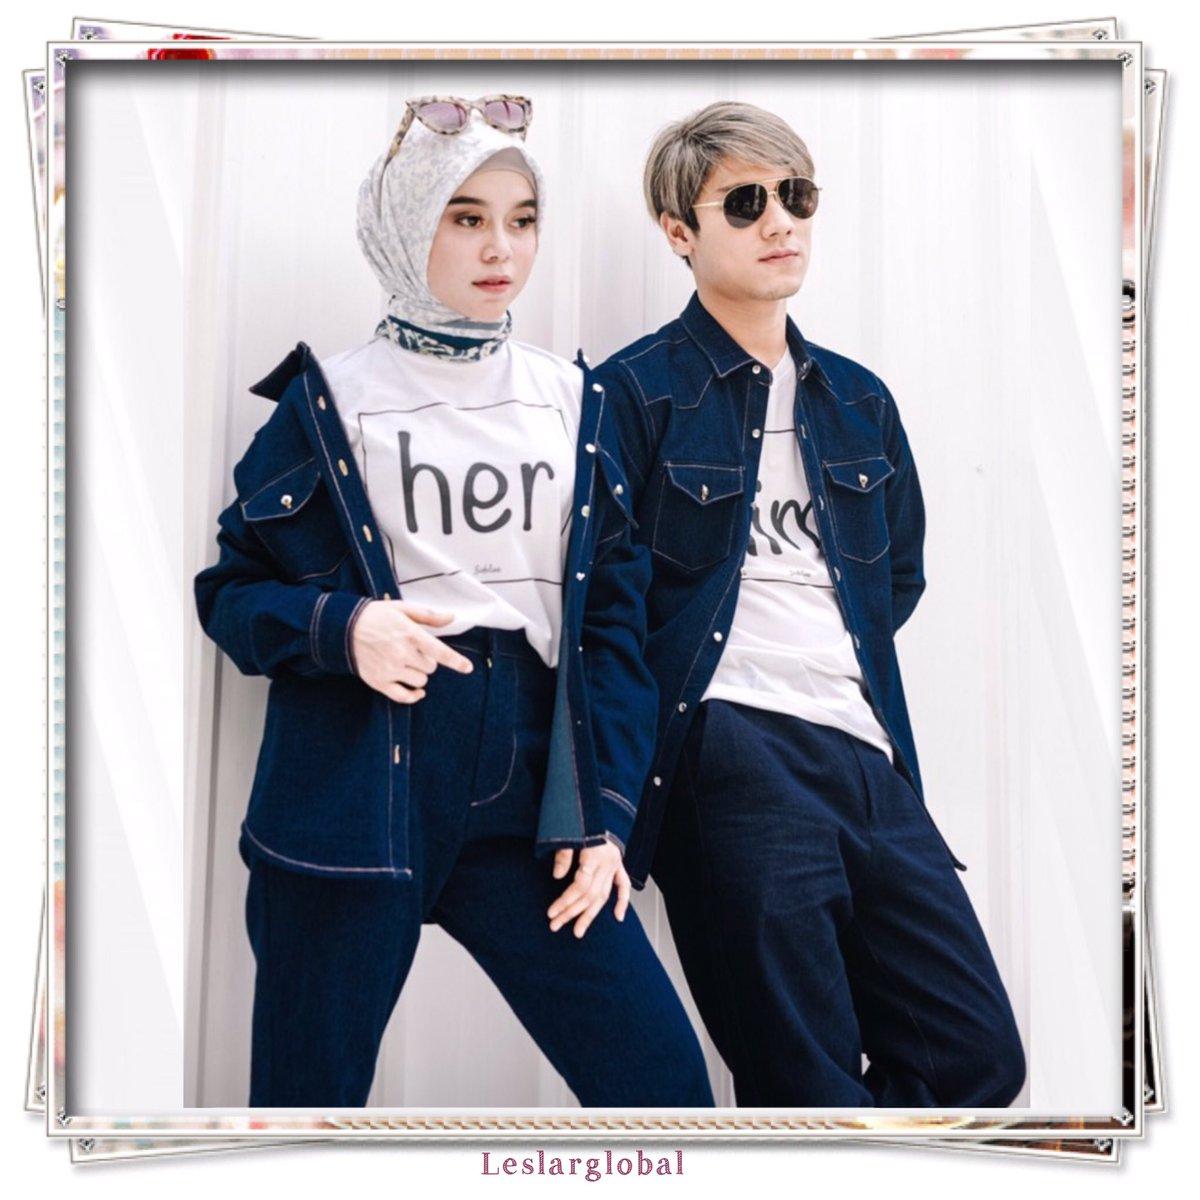 Leslar Fashion 😍😍💙🖤💙🖤 #leslar #fashion #supportleslar #cintasejati #truelove #perfectcouple #trendingcouple #kawalsampaihalal #leslarglobal #leslarlovers #leslarfans #leslarmendunia #leslarworld #indosiar https://t.co/y0x1vrvovO